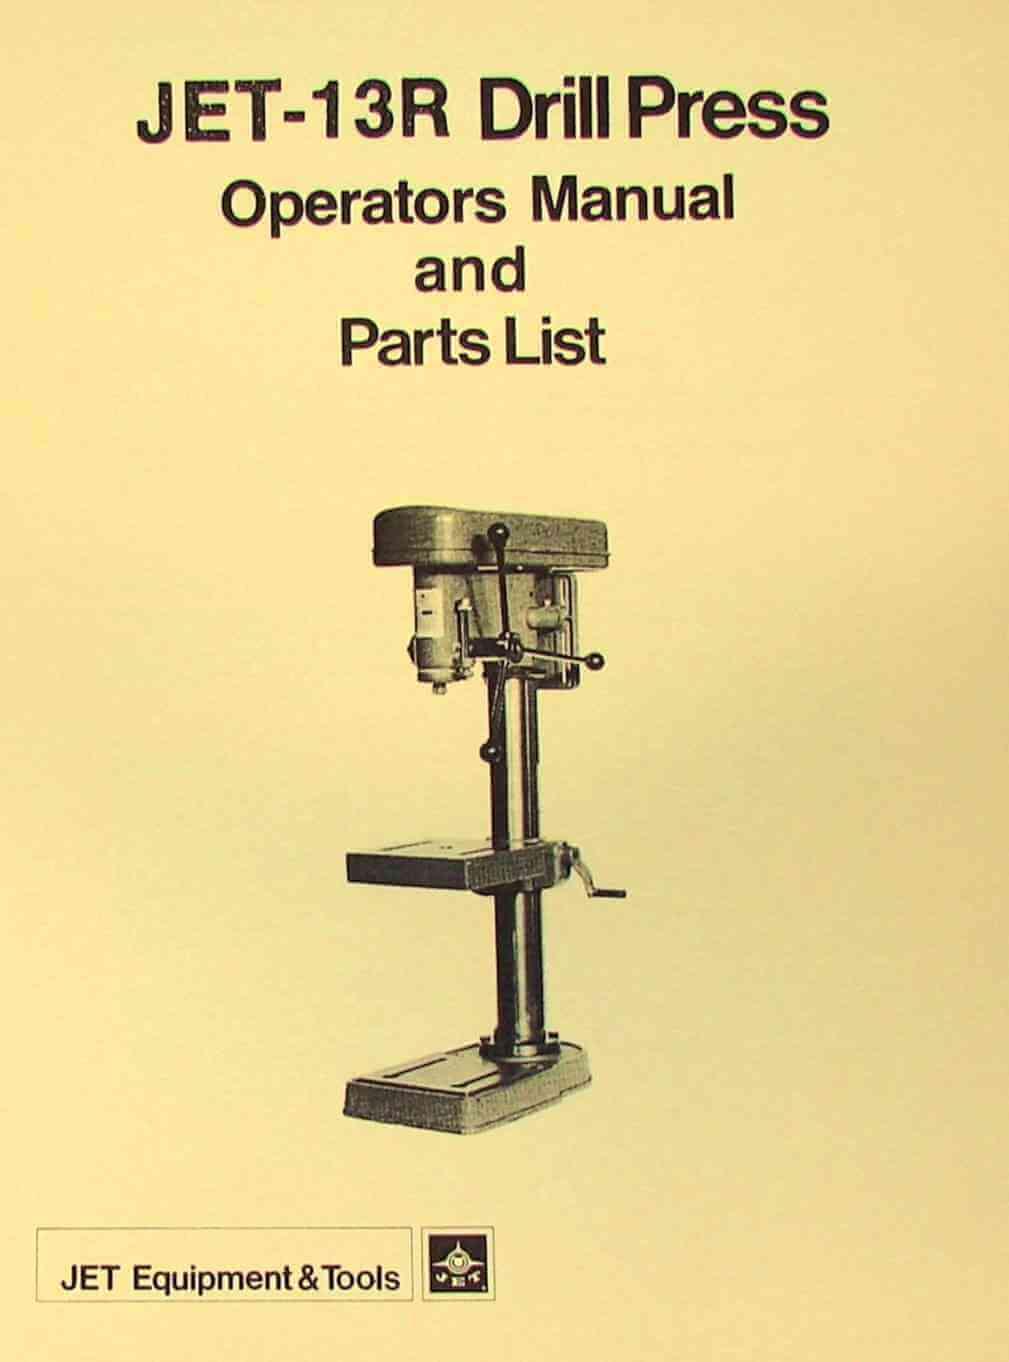 JET-Asian 13R Drill Press Owner's & Parts Manual | Ozark Tool Manuals & Books